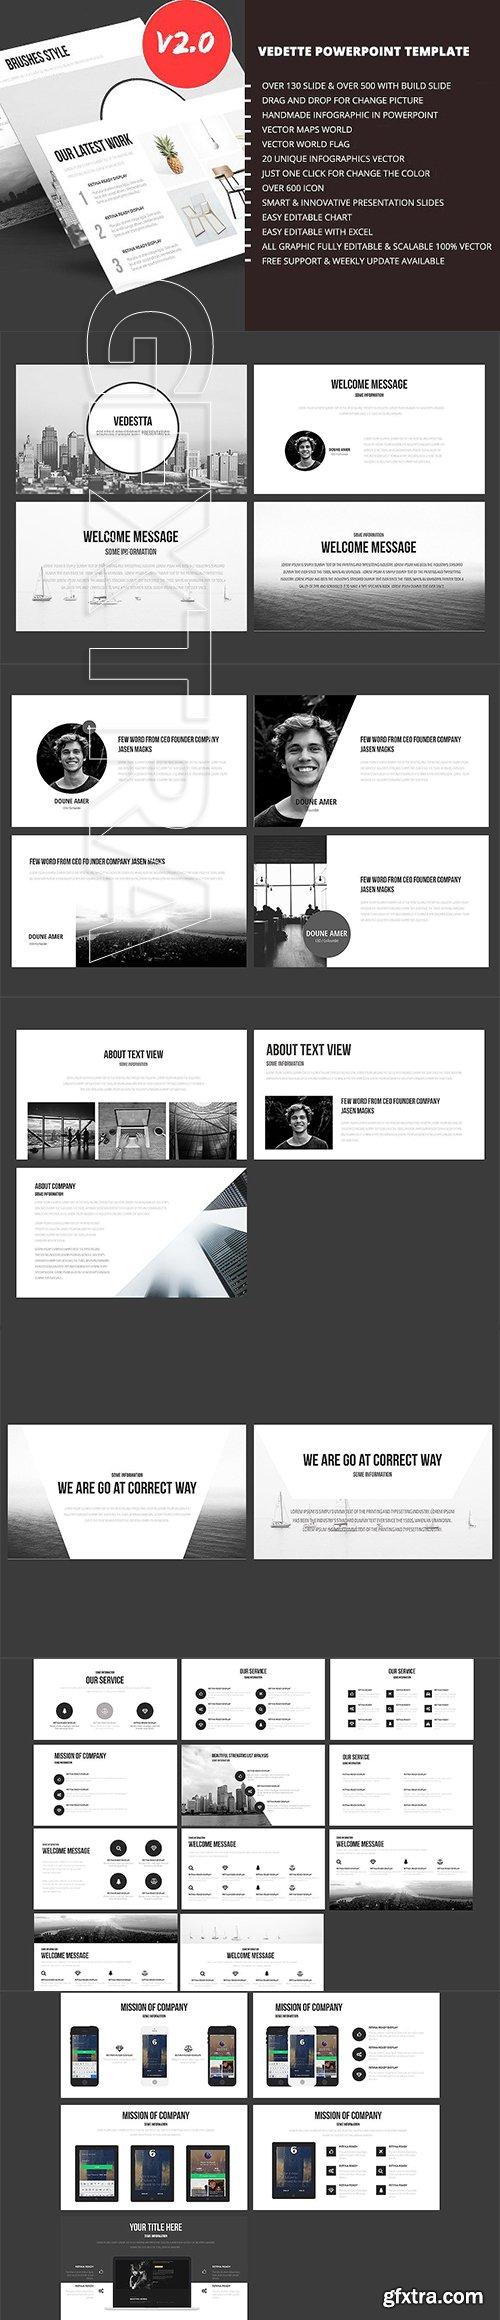 CreativeMarket - Vedette PowerPoint Template 2607357